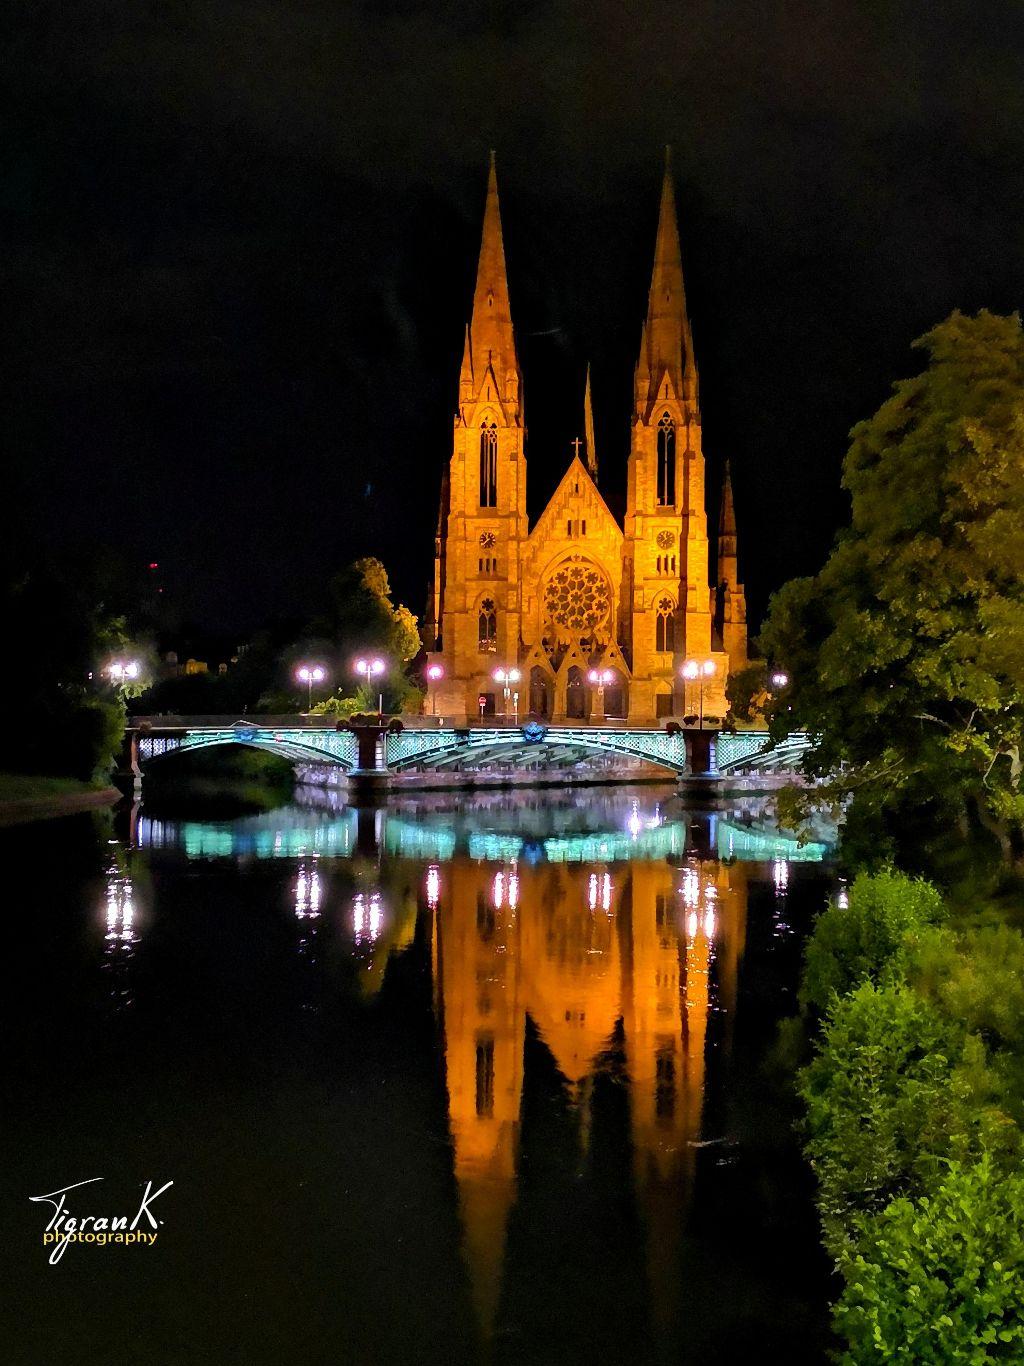 Beautiful nights in Strasbourg. #cathedral #strasbourg #alsace #france #bridge #reflection #nightshot #beautifulfrance #labellefrance